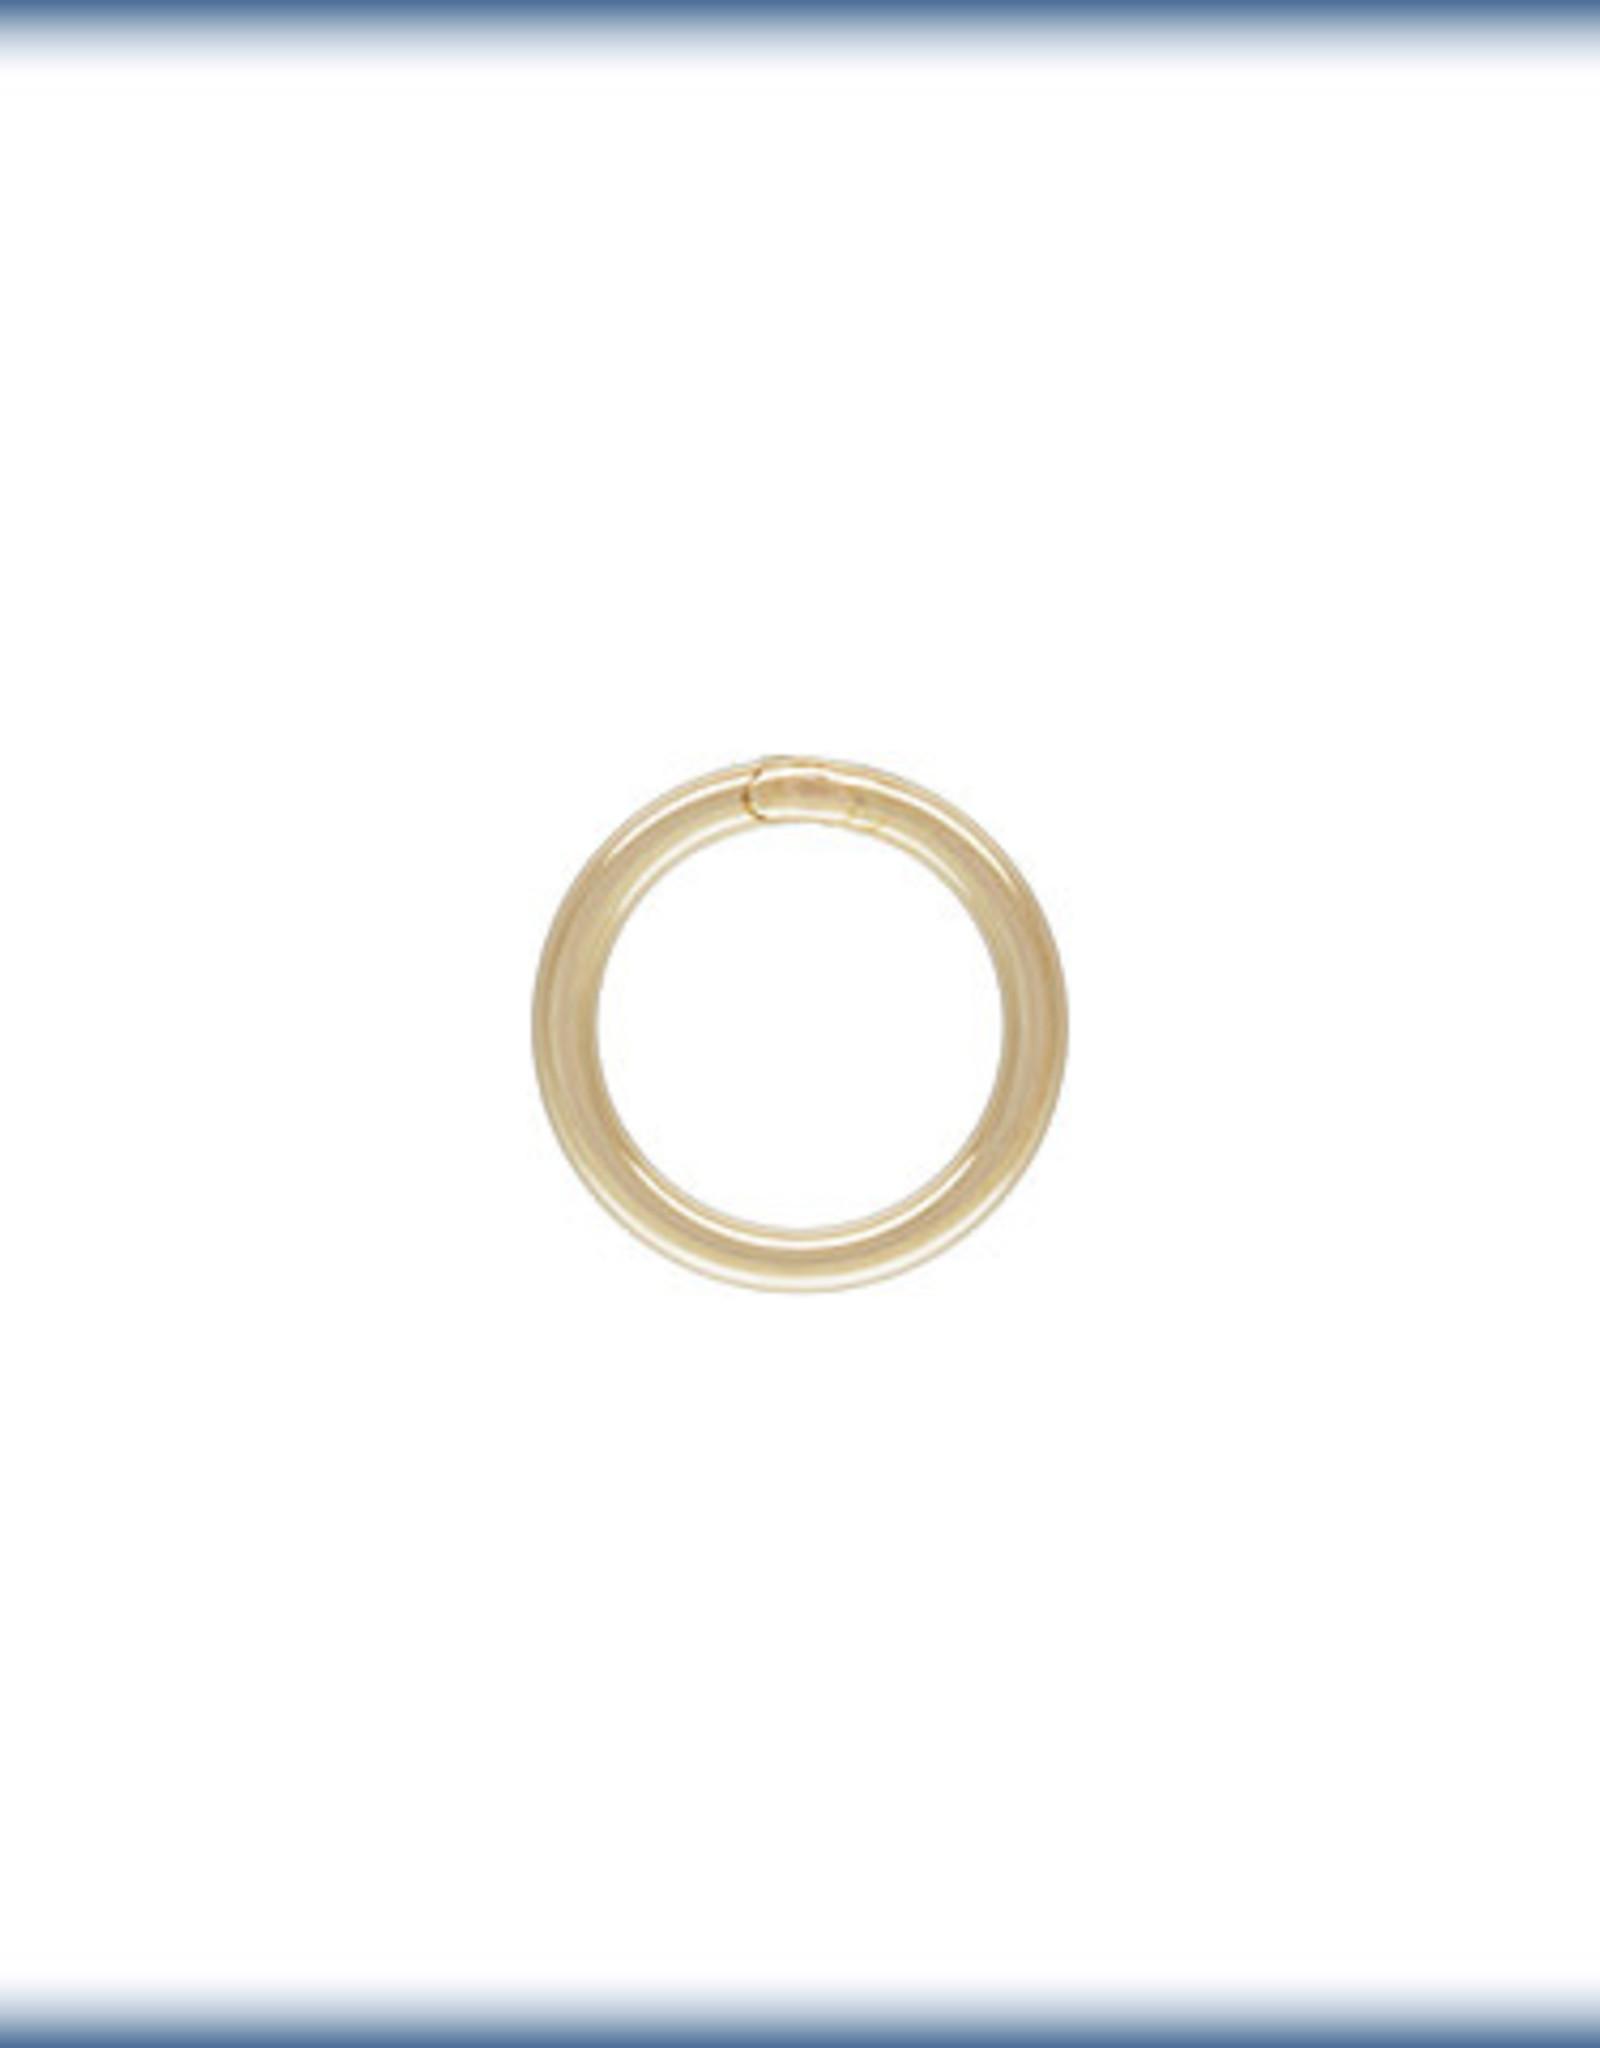 5mm Closed Ring 22 ga Gold Filled Qty 12